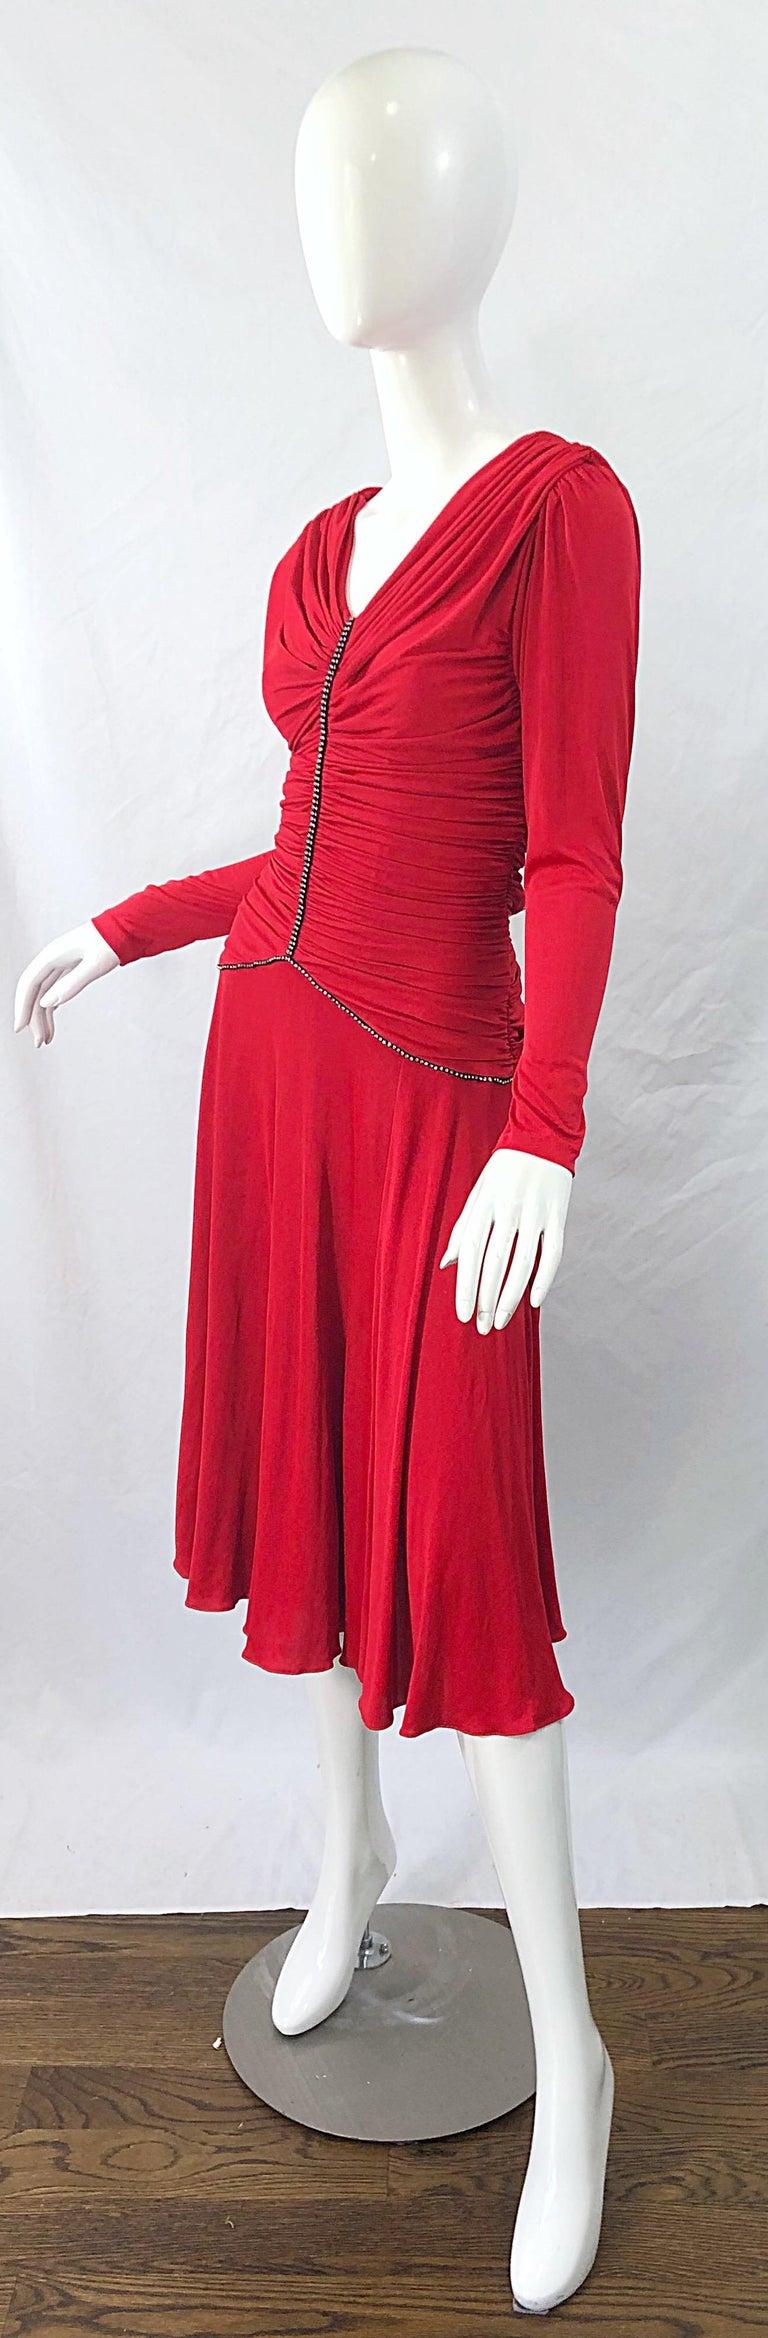 1970s Claraluna Original Lipstick Red Rhinestone Slinky Jersey Vintage 70s Dress For Sale 1